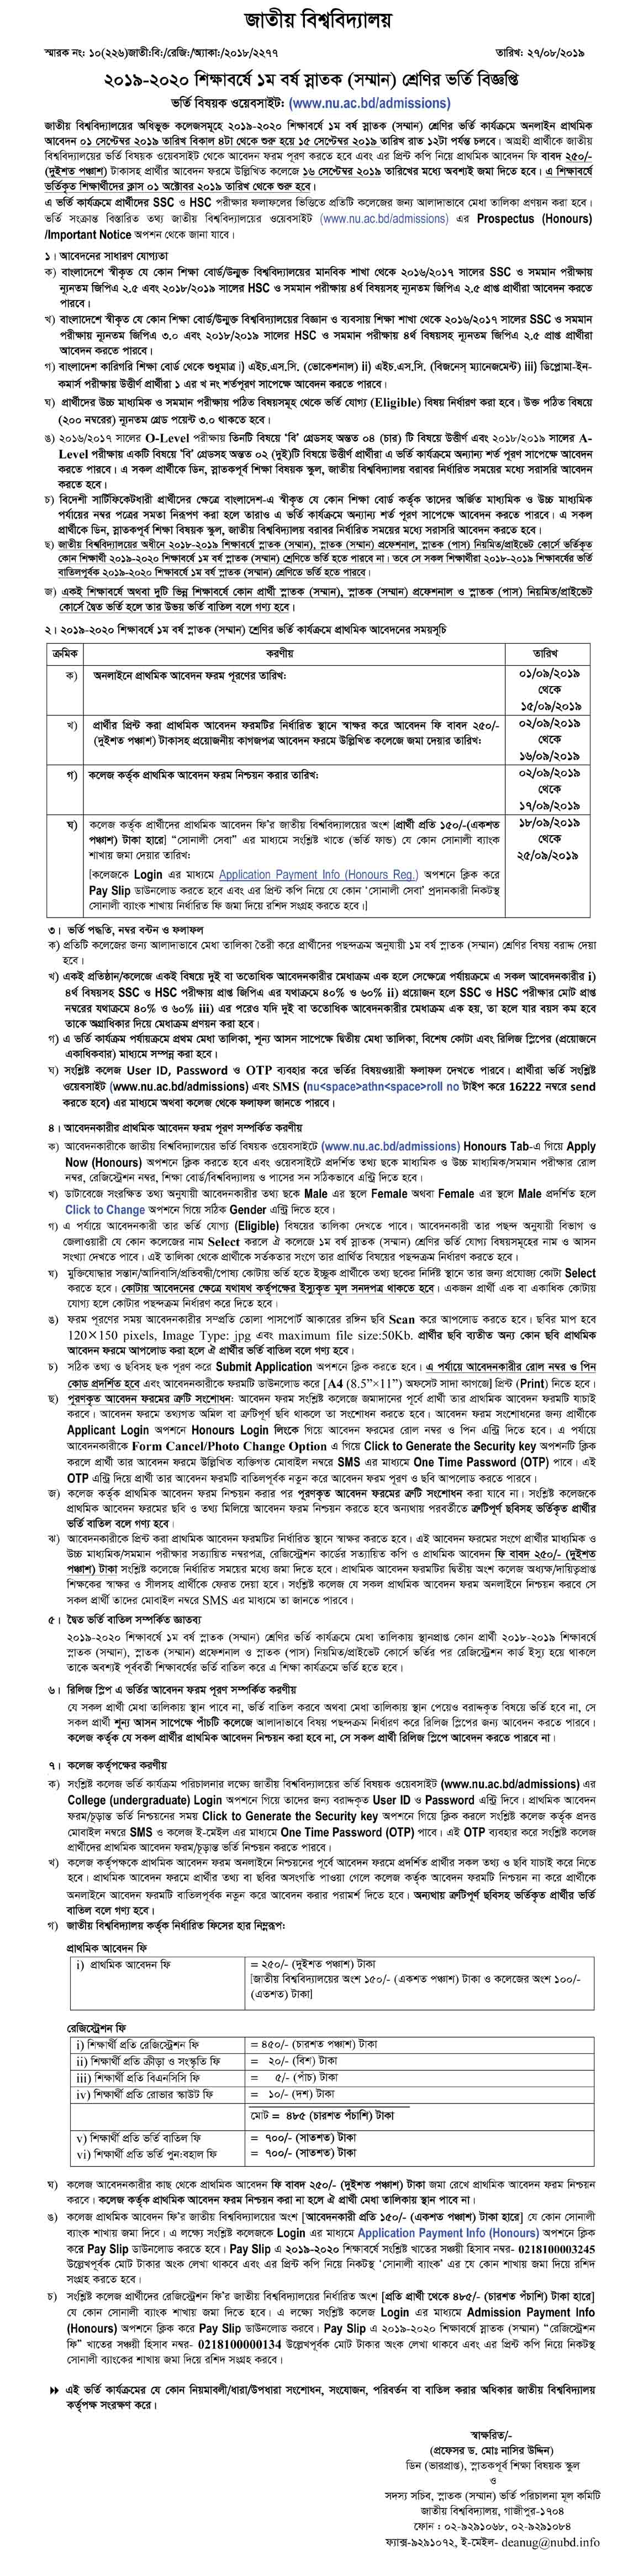 National University admission circular 2019